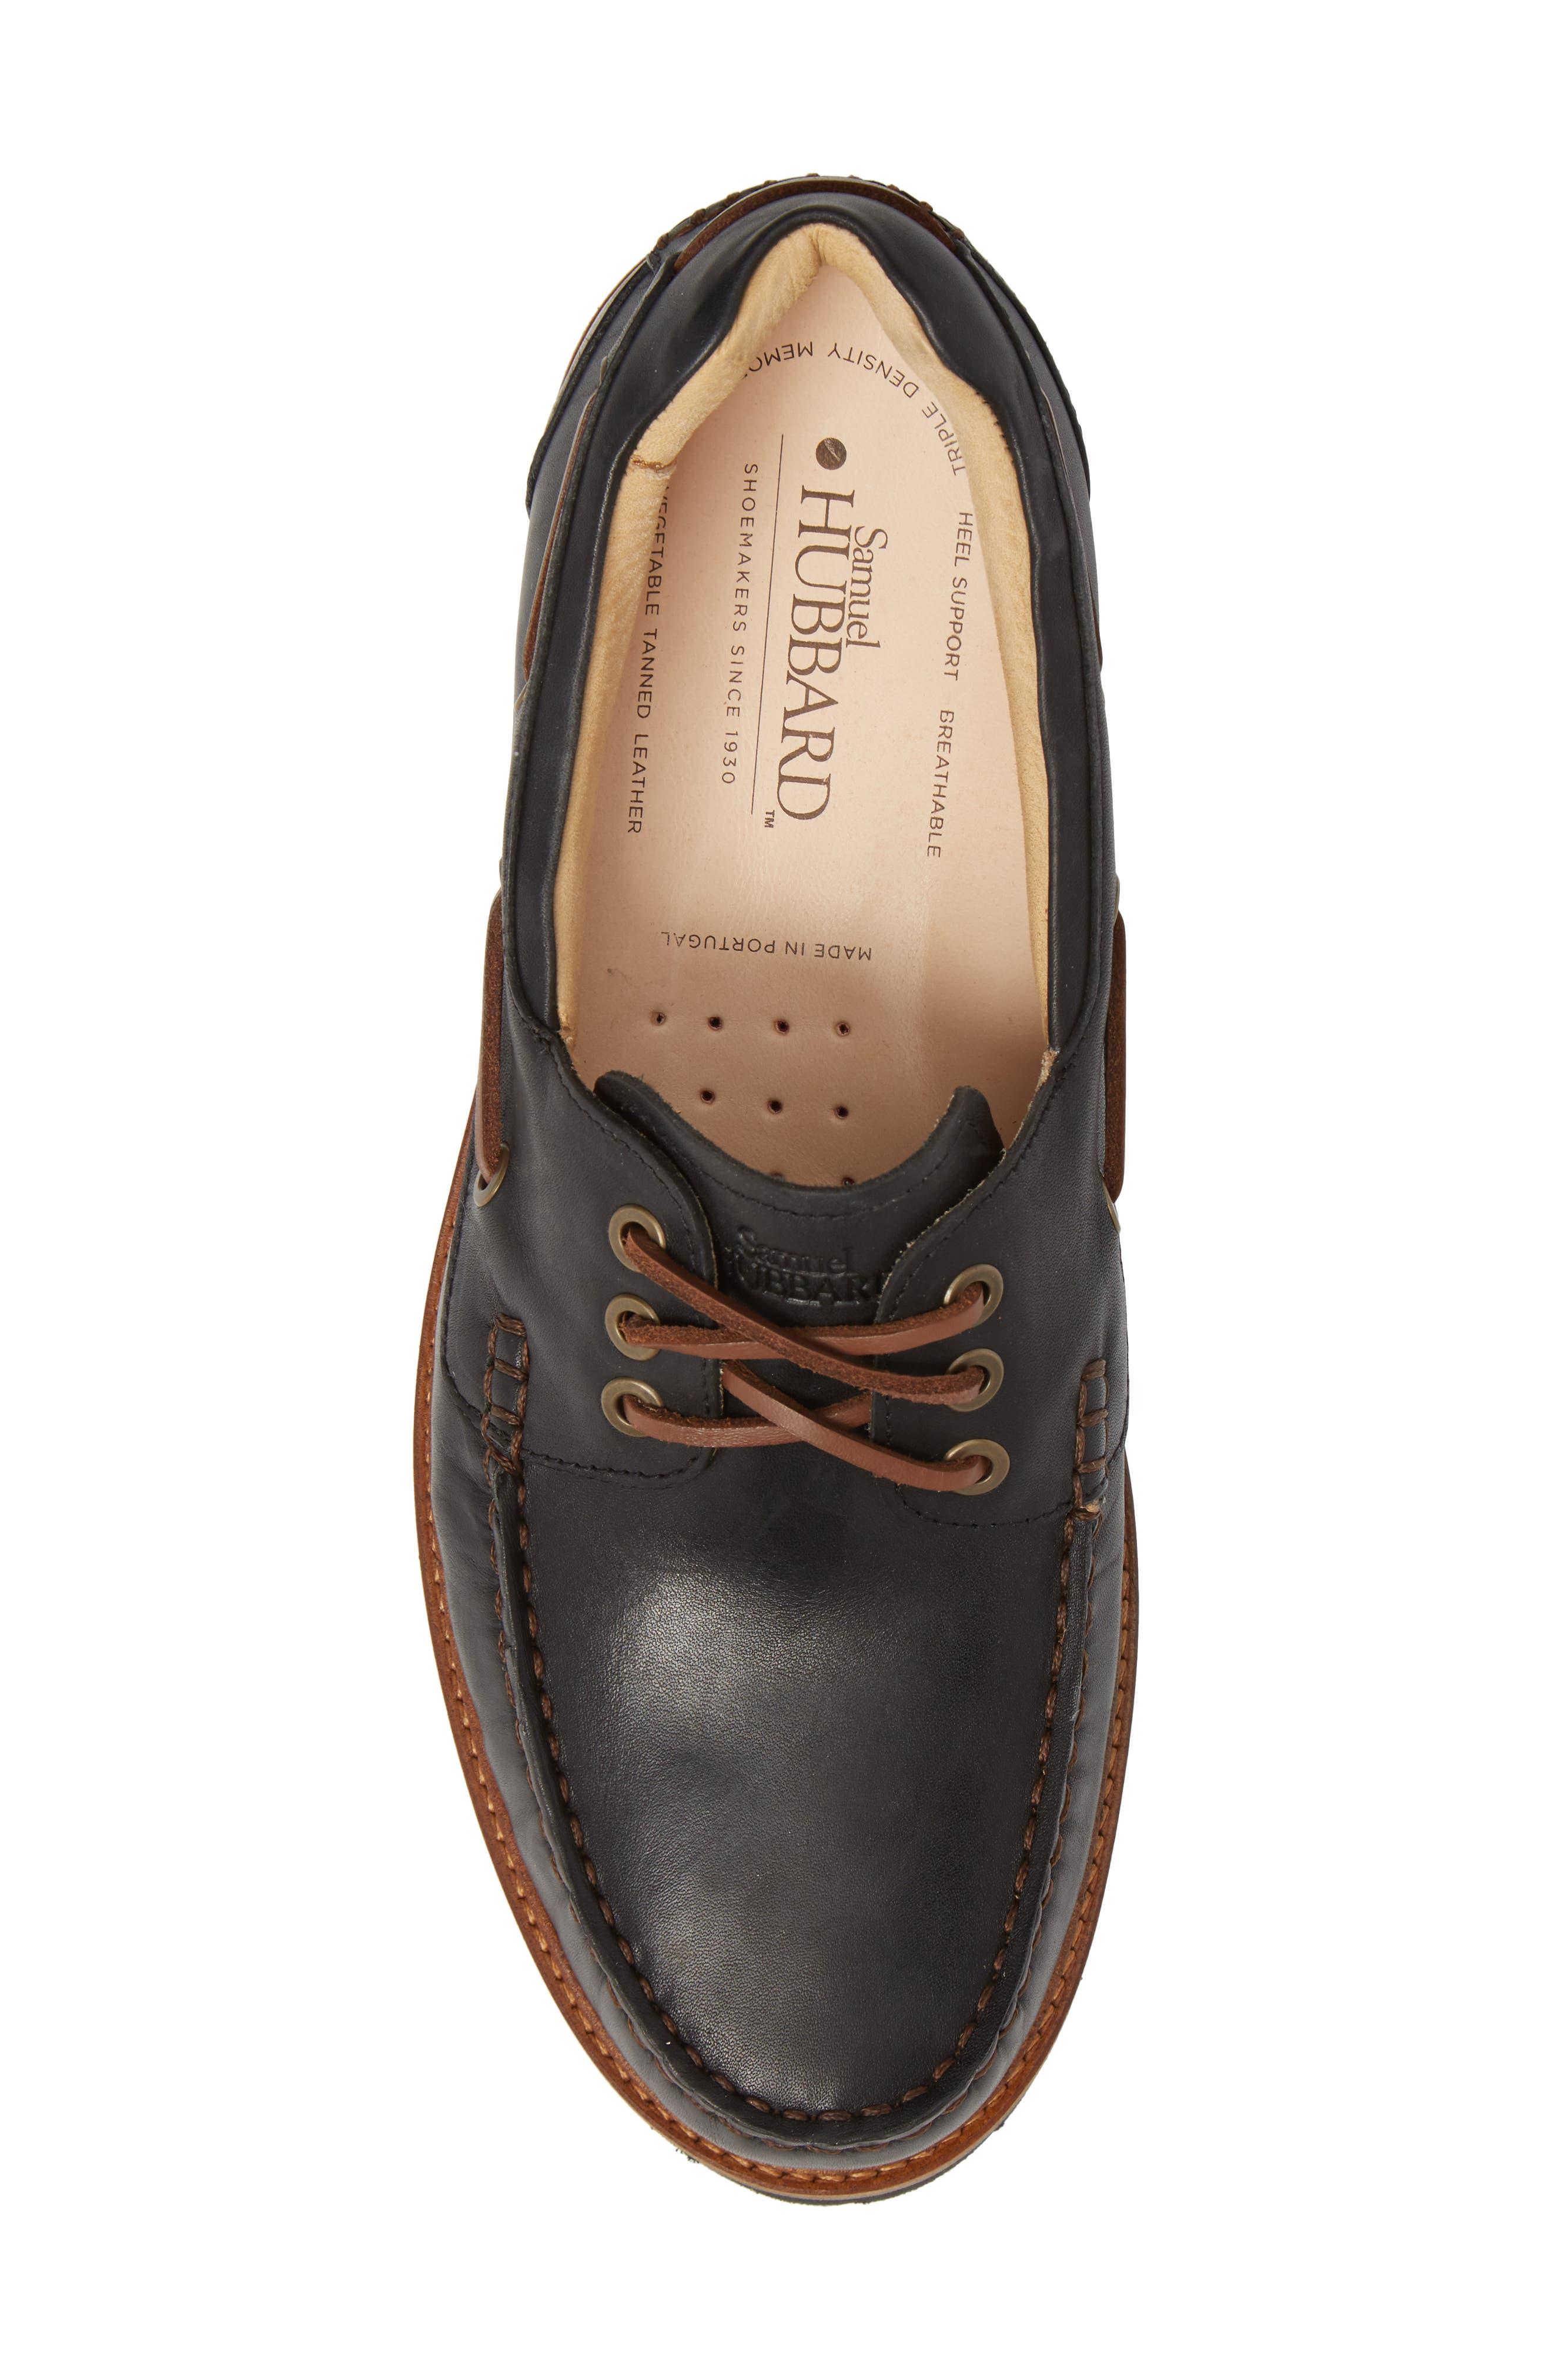 Camplight Water Resistant Boat Shoe,                             Alternate thumbnail 5, color,                             Saddlebag Black Leather